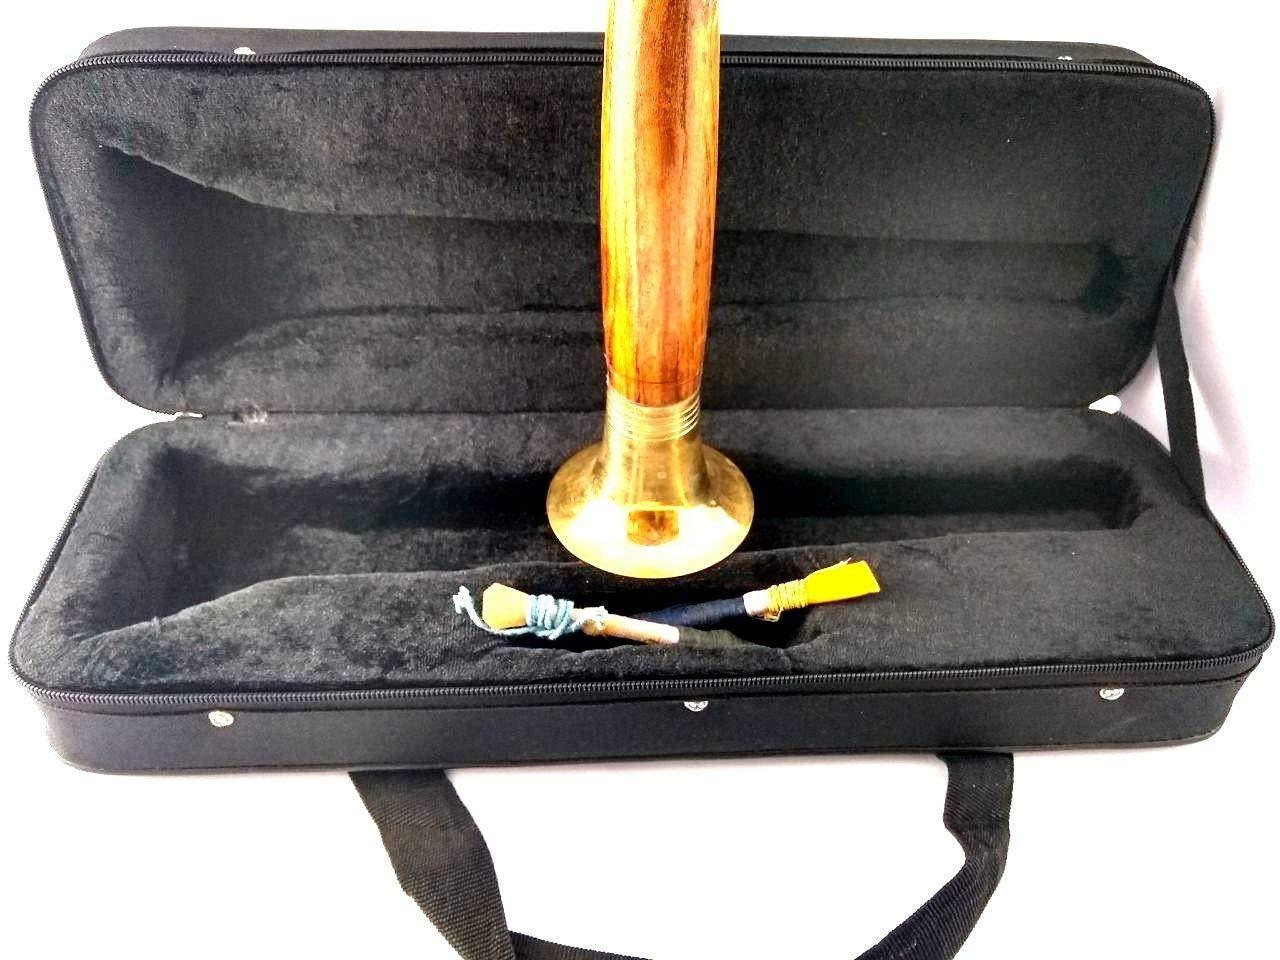 indian shahnai Shehnai Music Instrument with reed & box shenoy sanai shenai